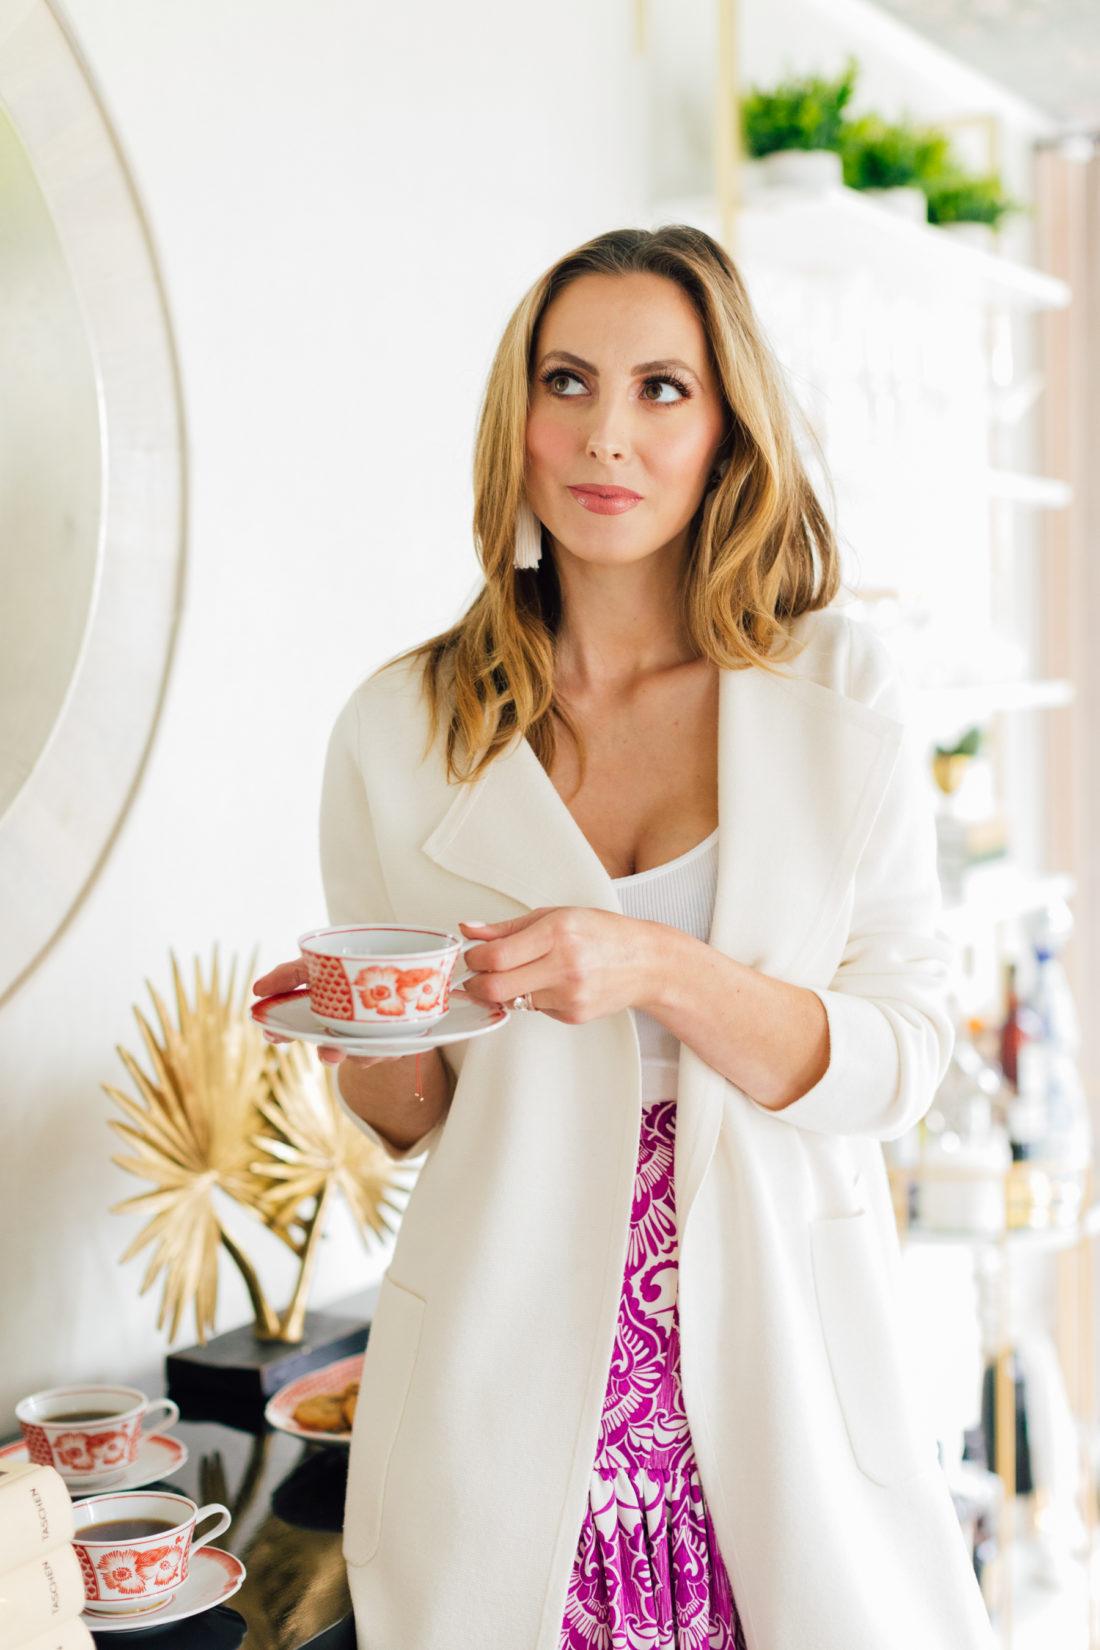 Eva Amurri Martino sips coffee from an Oscar de la Renta's Coralina China